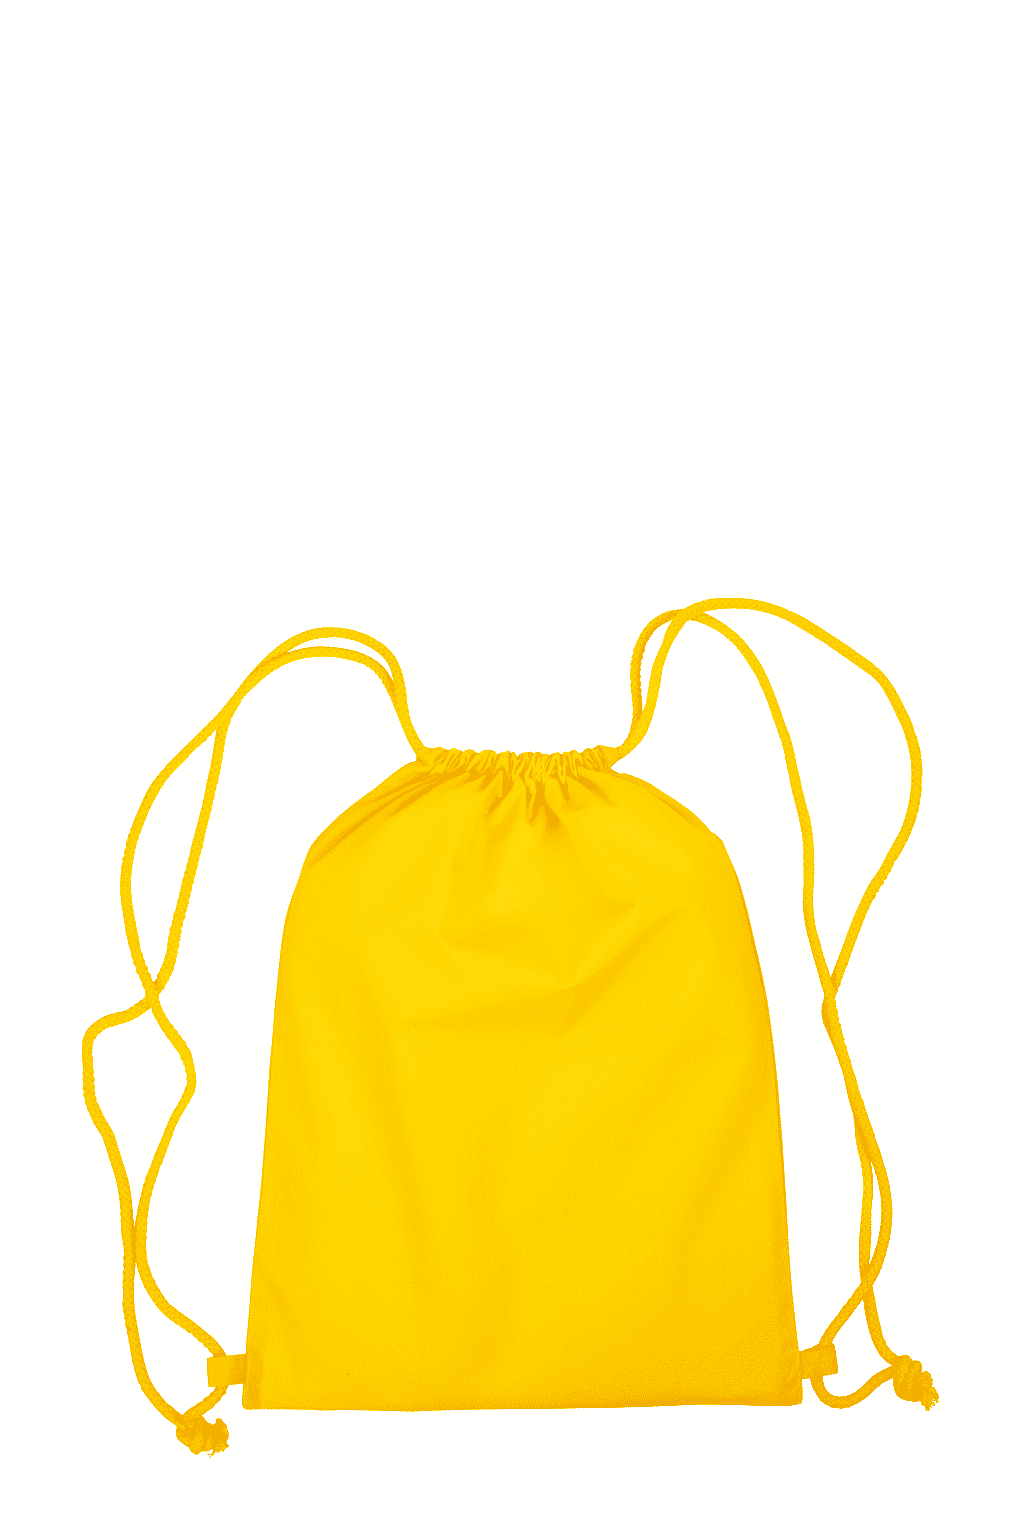 gelber Beutel